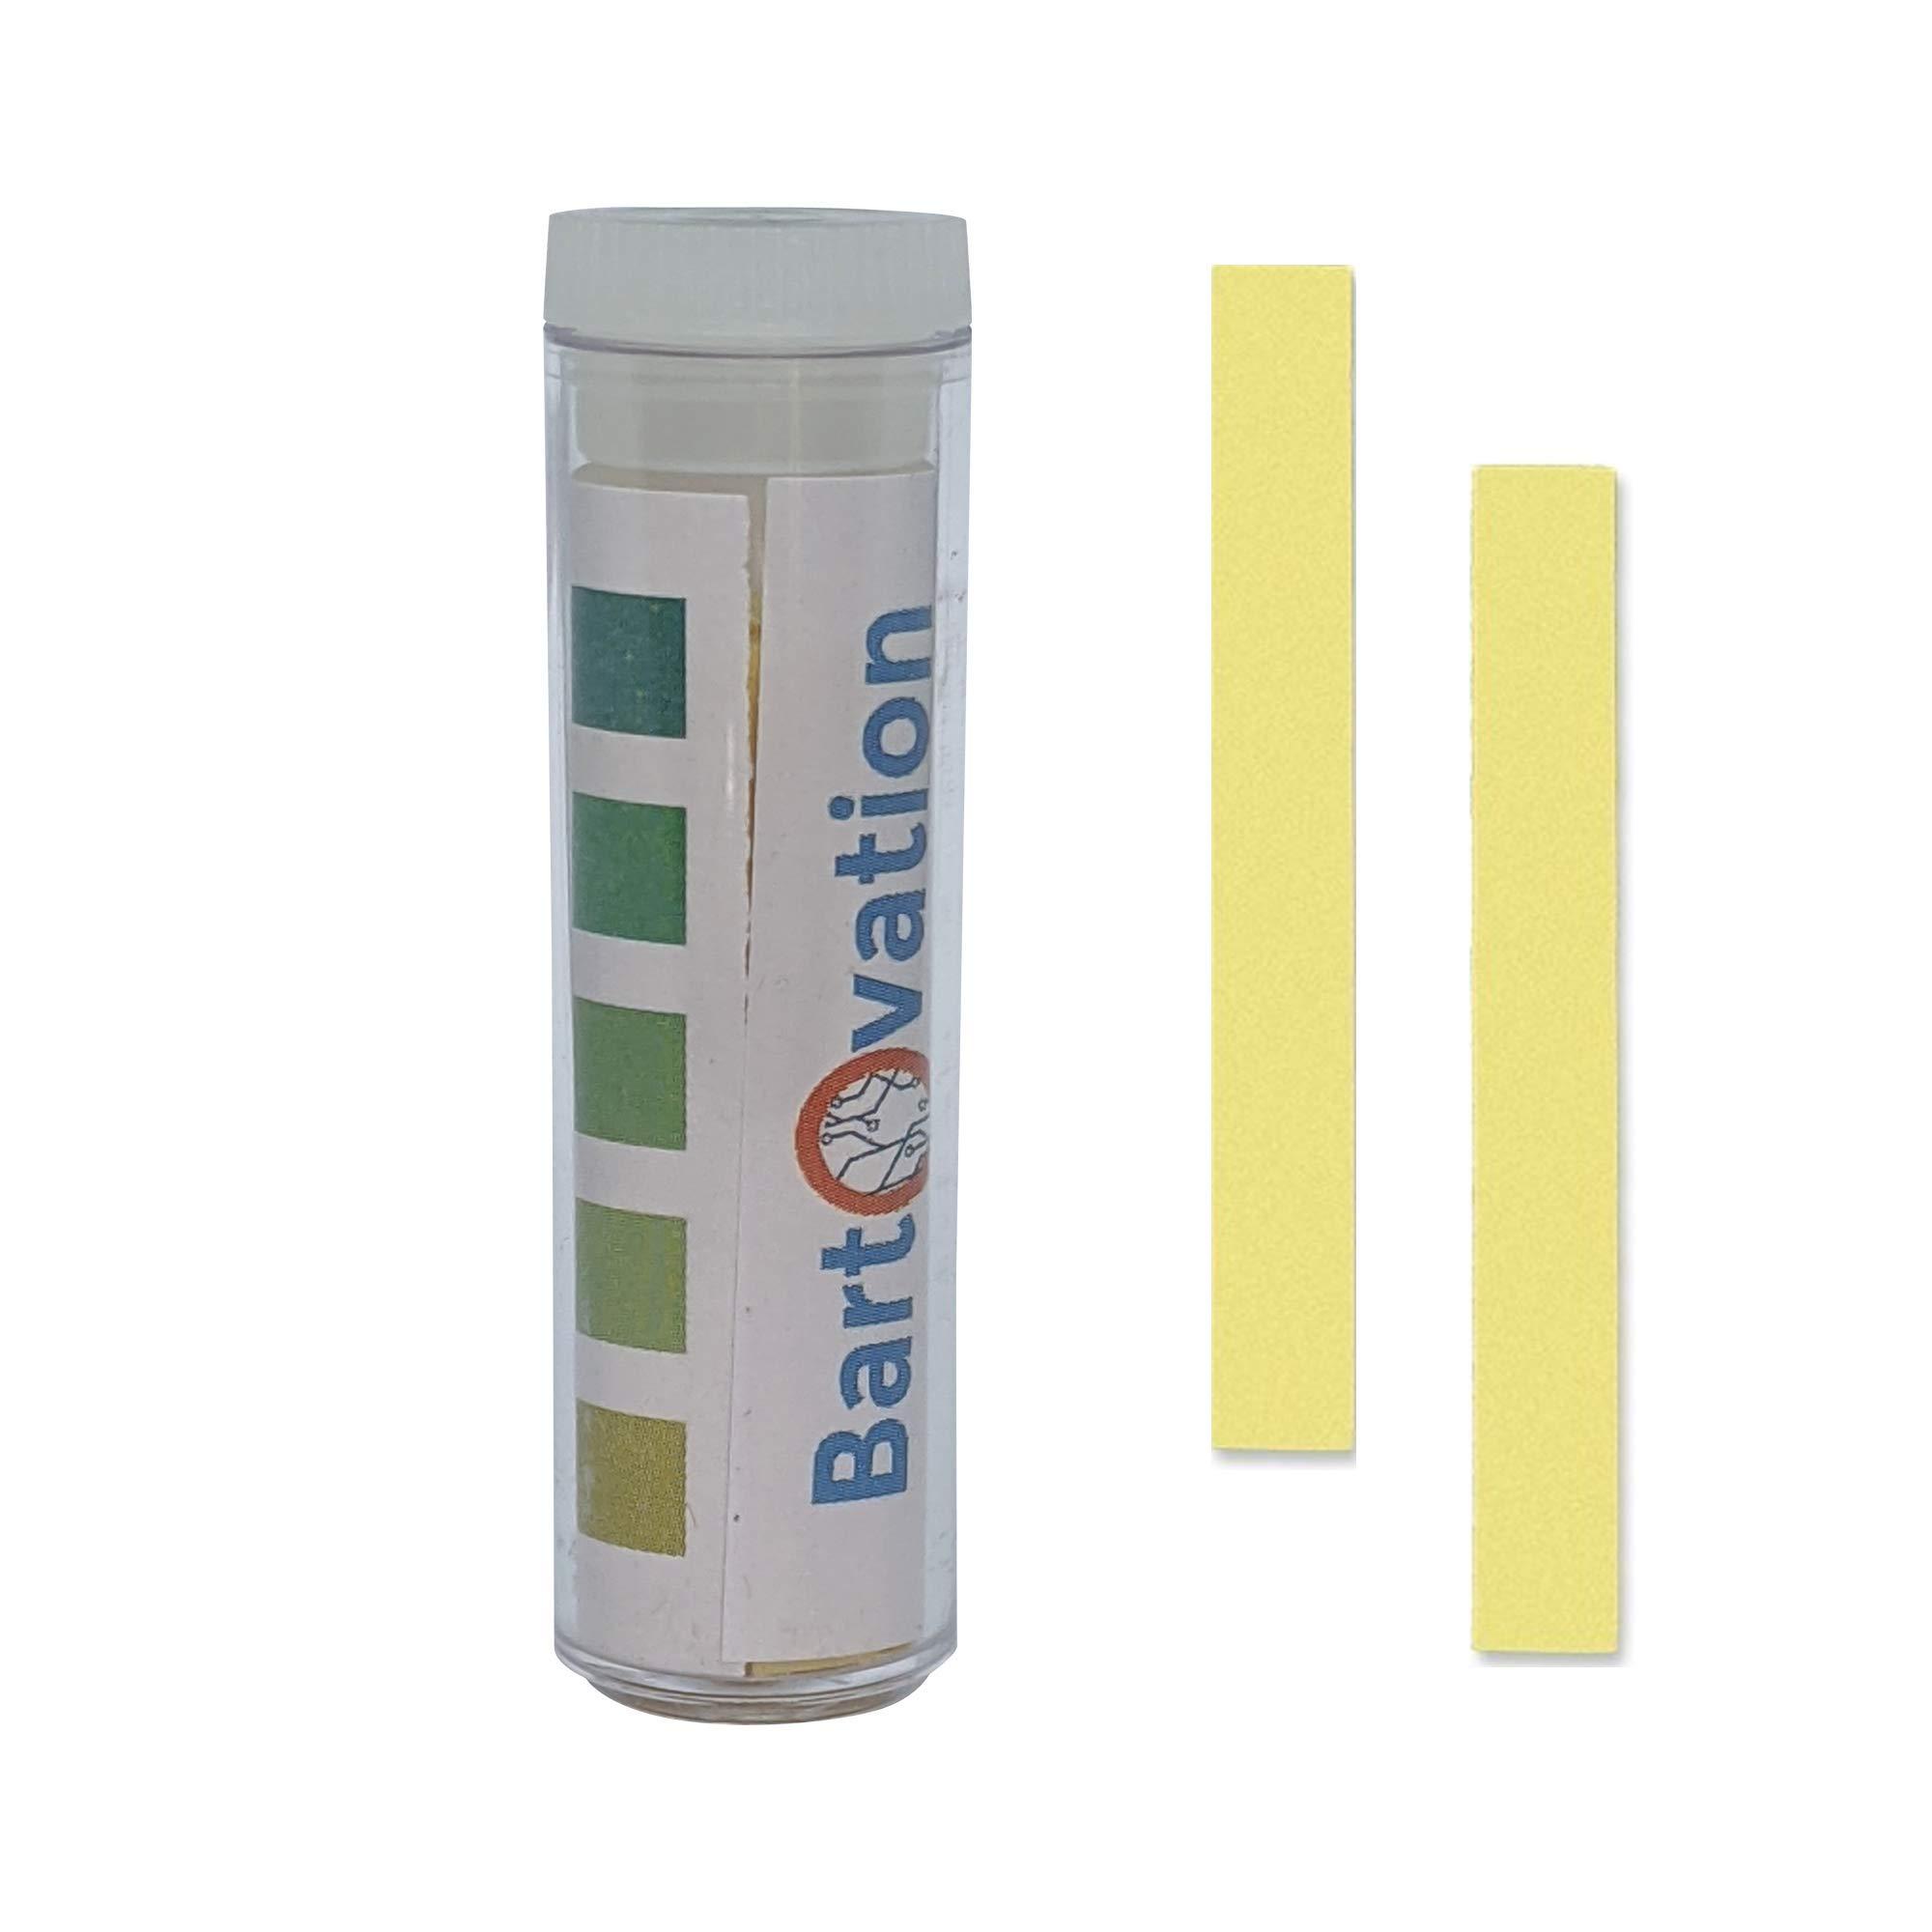 Restaurant Quaternary Ammonium (QAC, Multi Quat) Sanitizer Test Paper, 0-500 ppm [Vial of 100 Paper Strips]